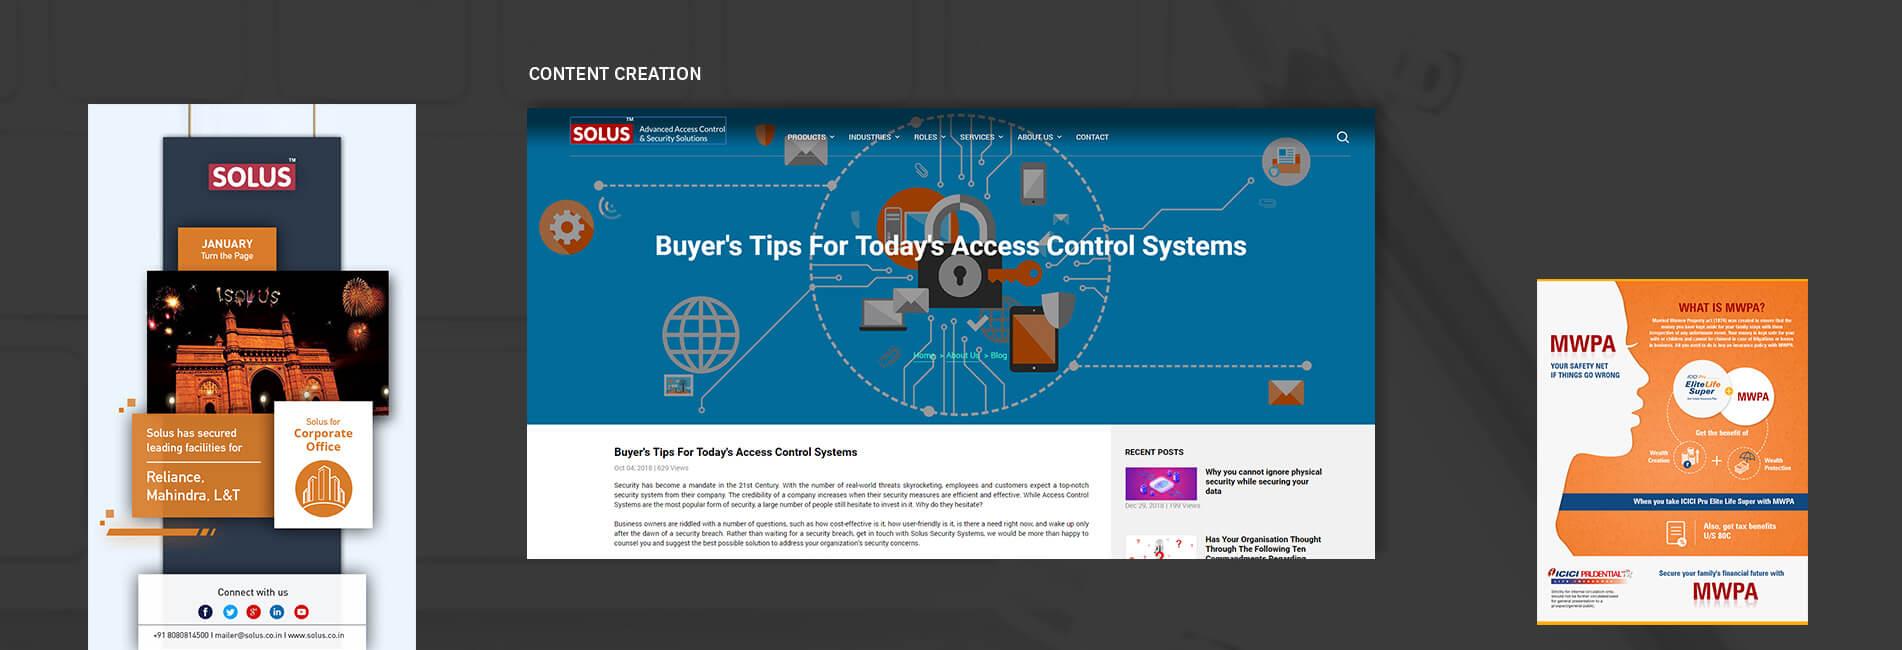 content creation marketing